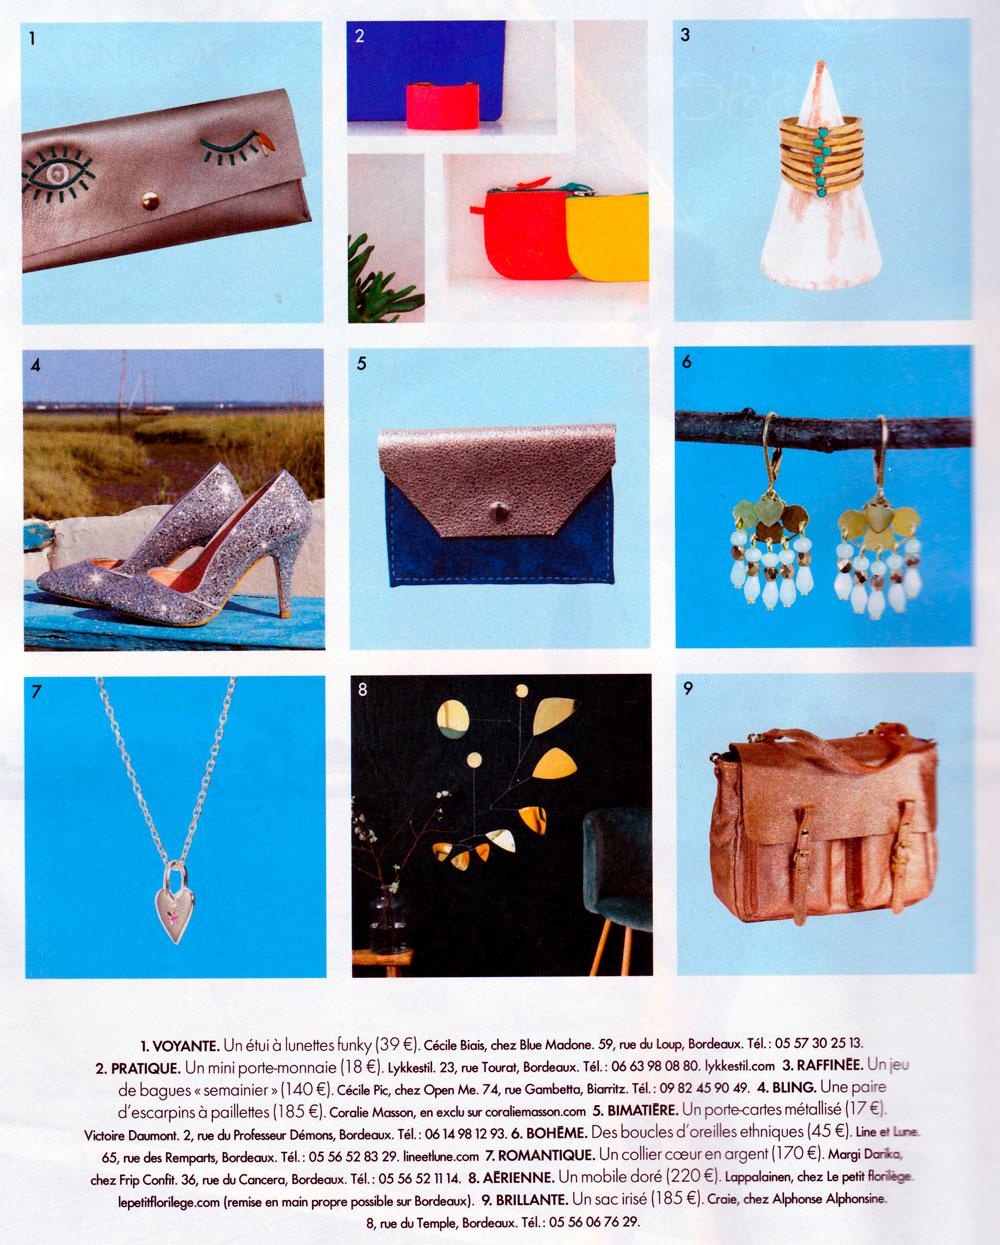 Elle magazine parution Margi Darika.